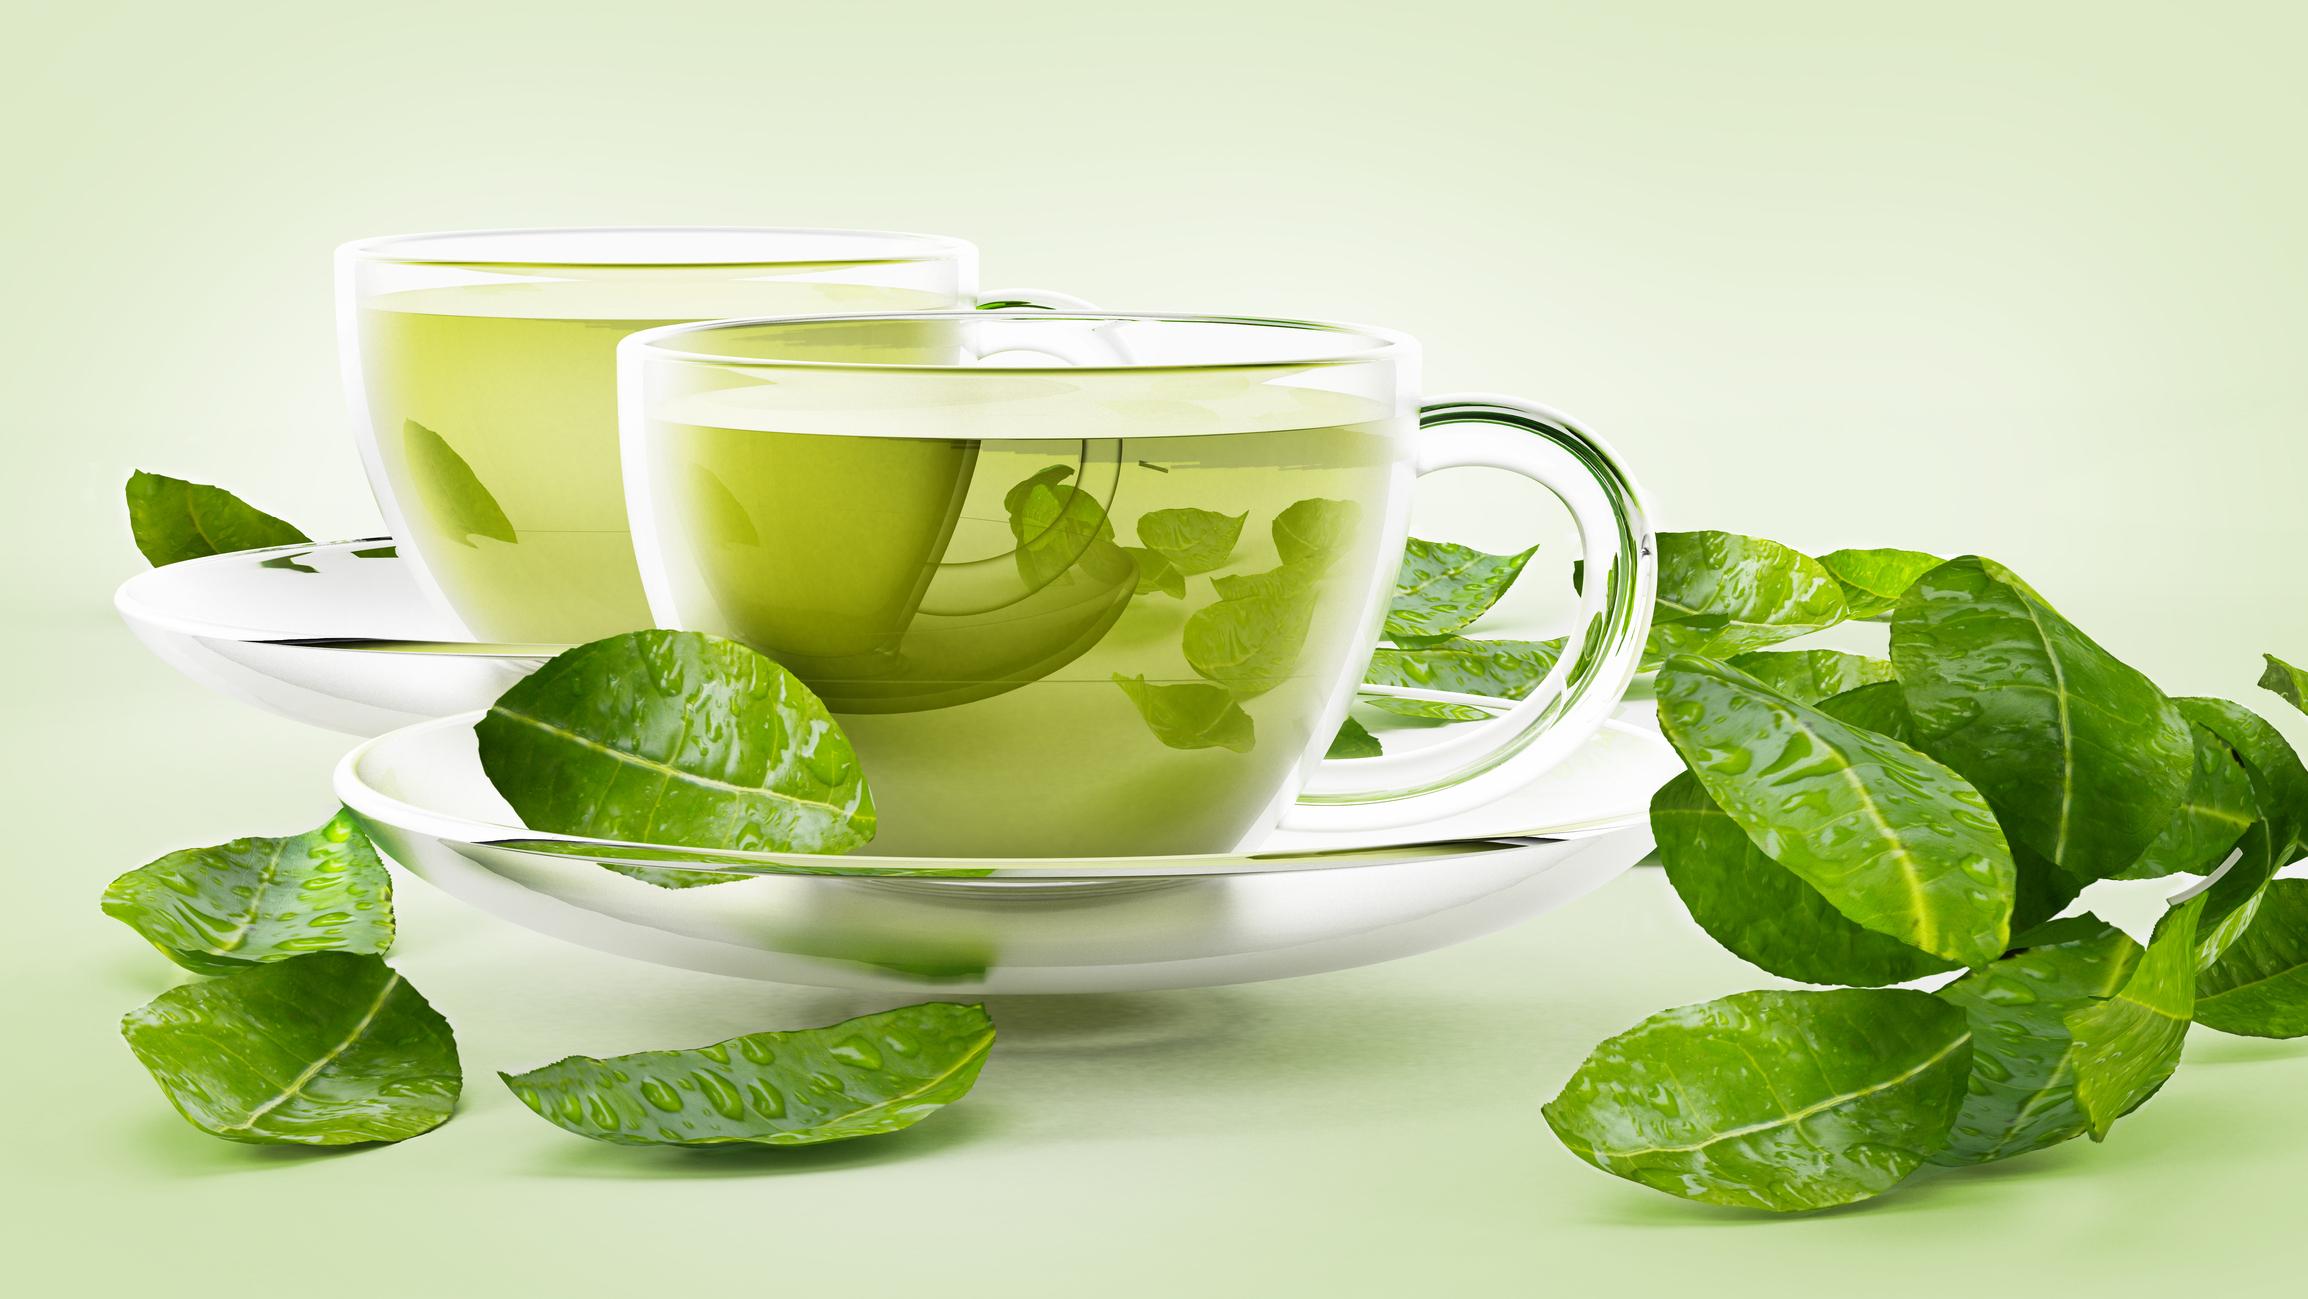 بالصور اضرار الشاي , الشاي له اضرار عديده 1966 1